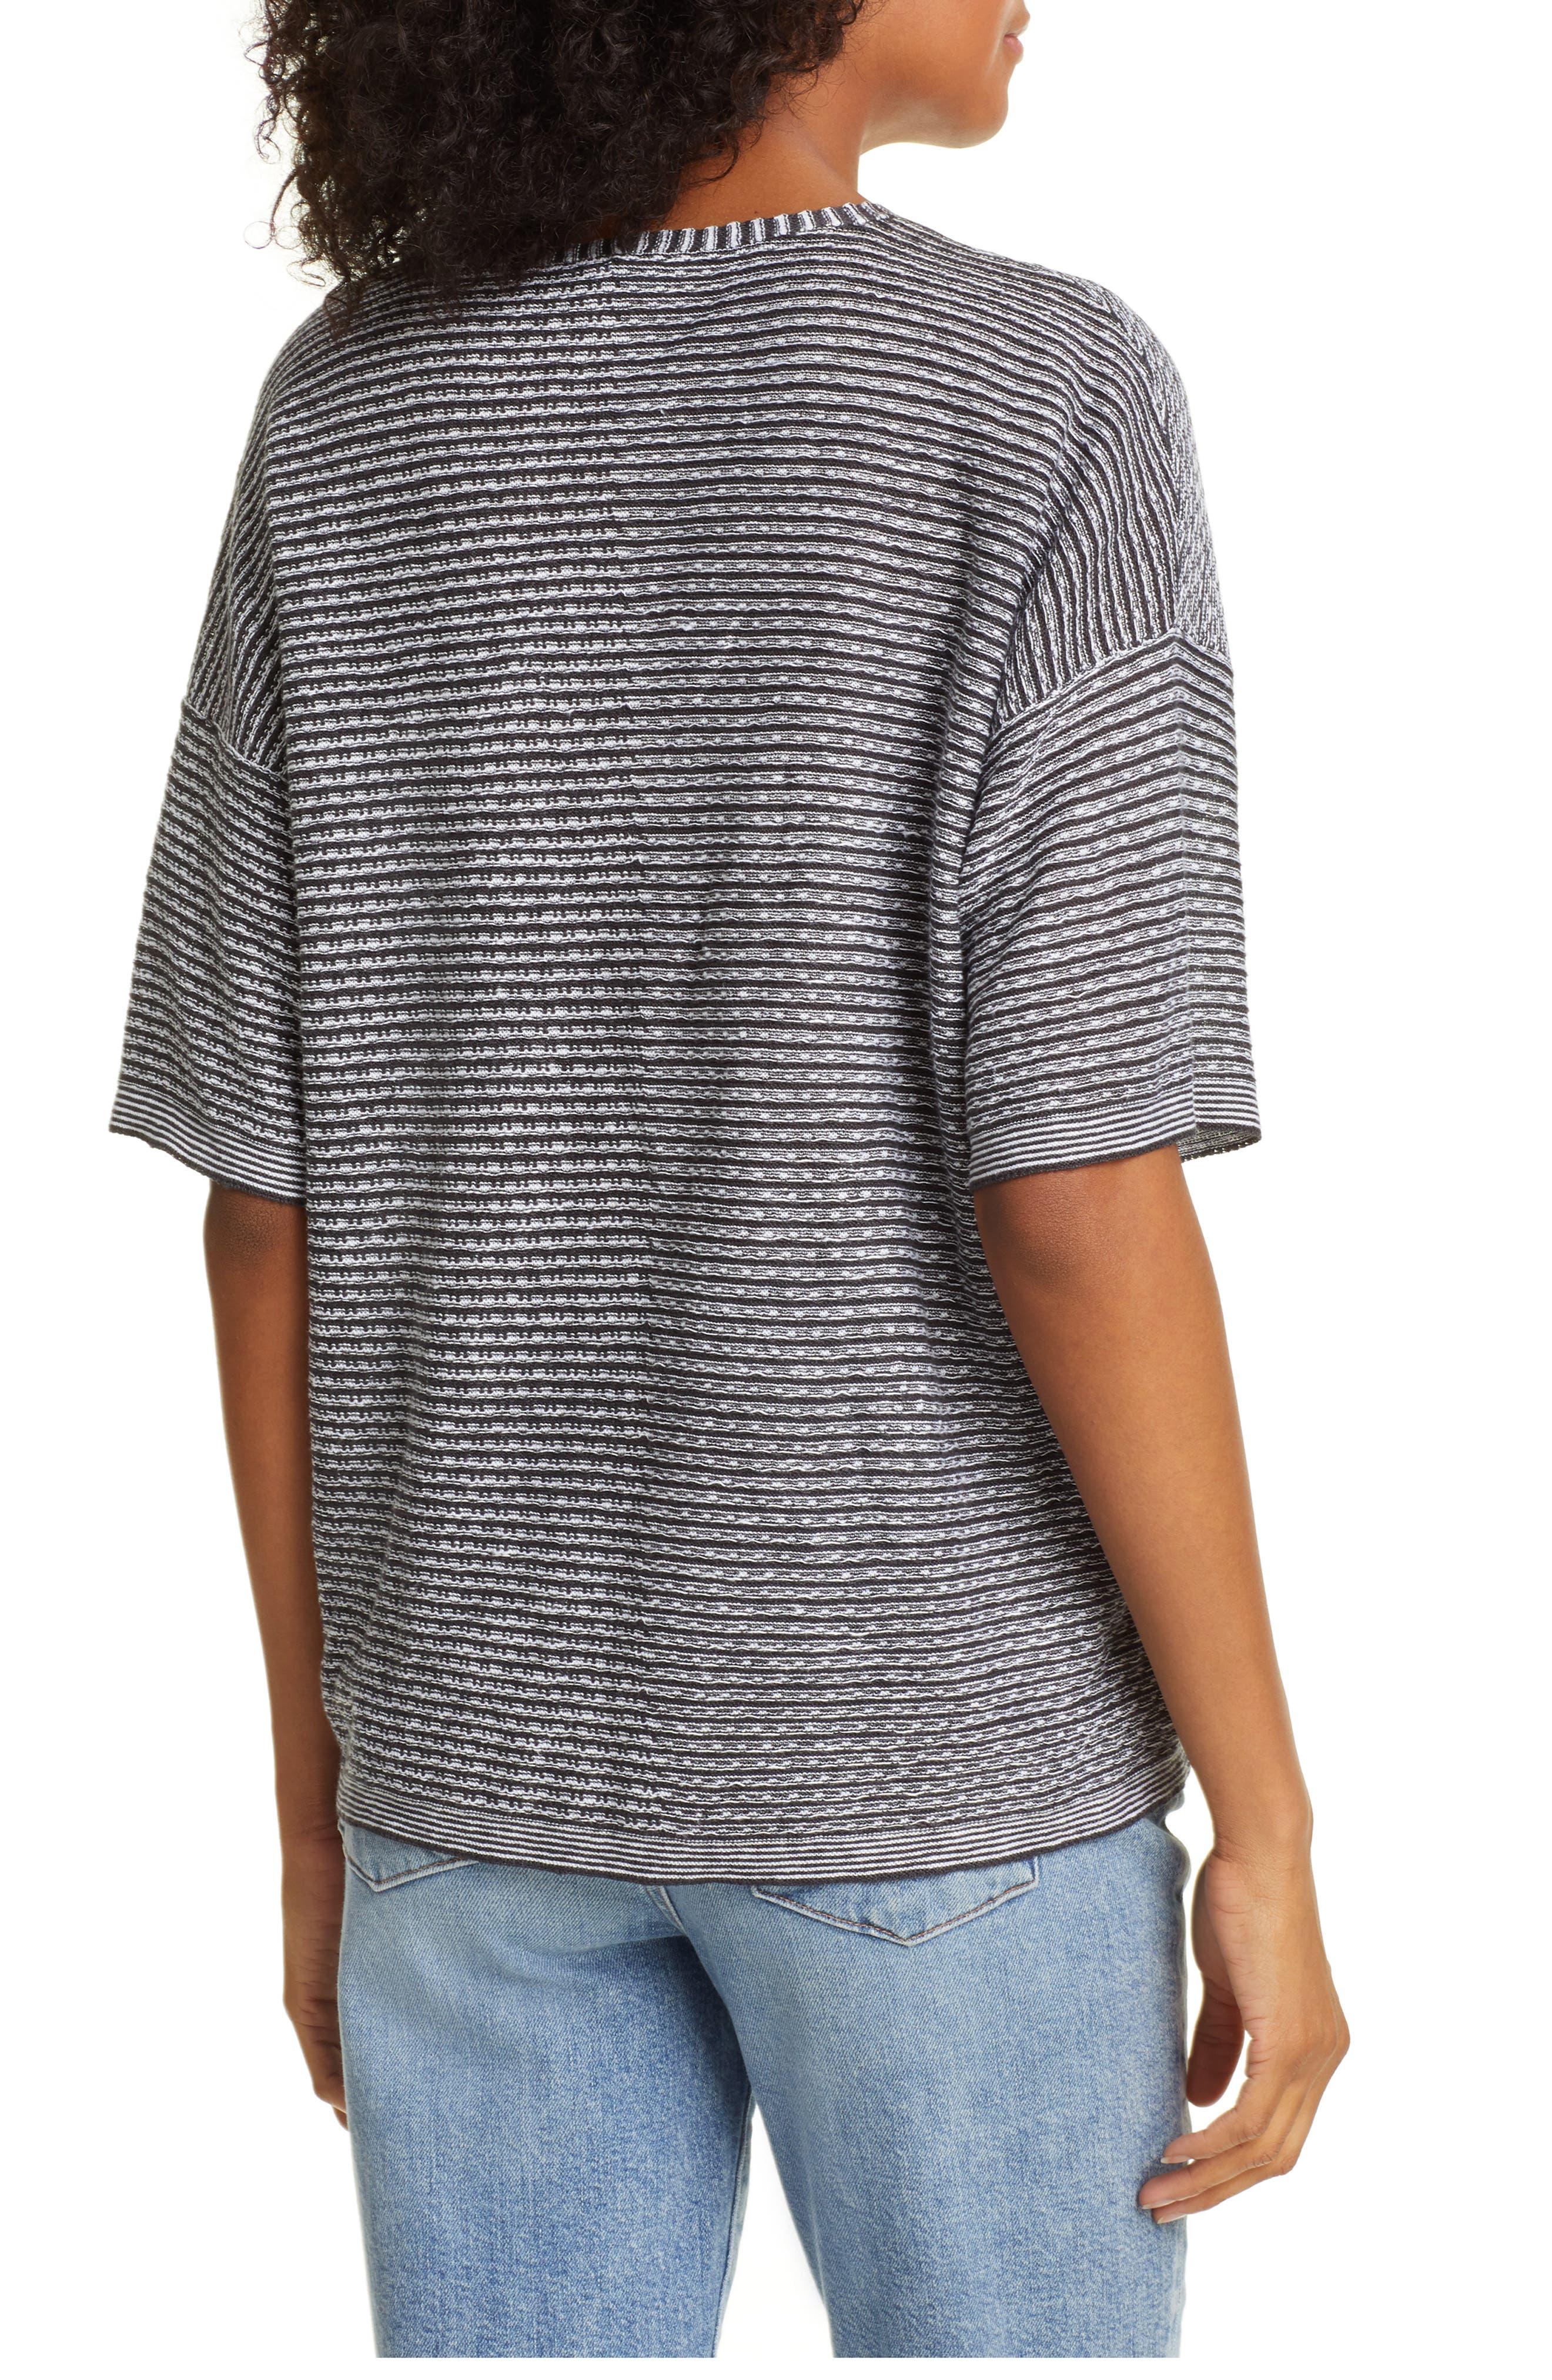 EILEEN FISHER, Organic Linen Jacquard Sweater, Alternate thumbnail 2, color, IVORY